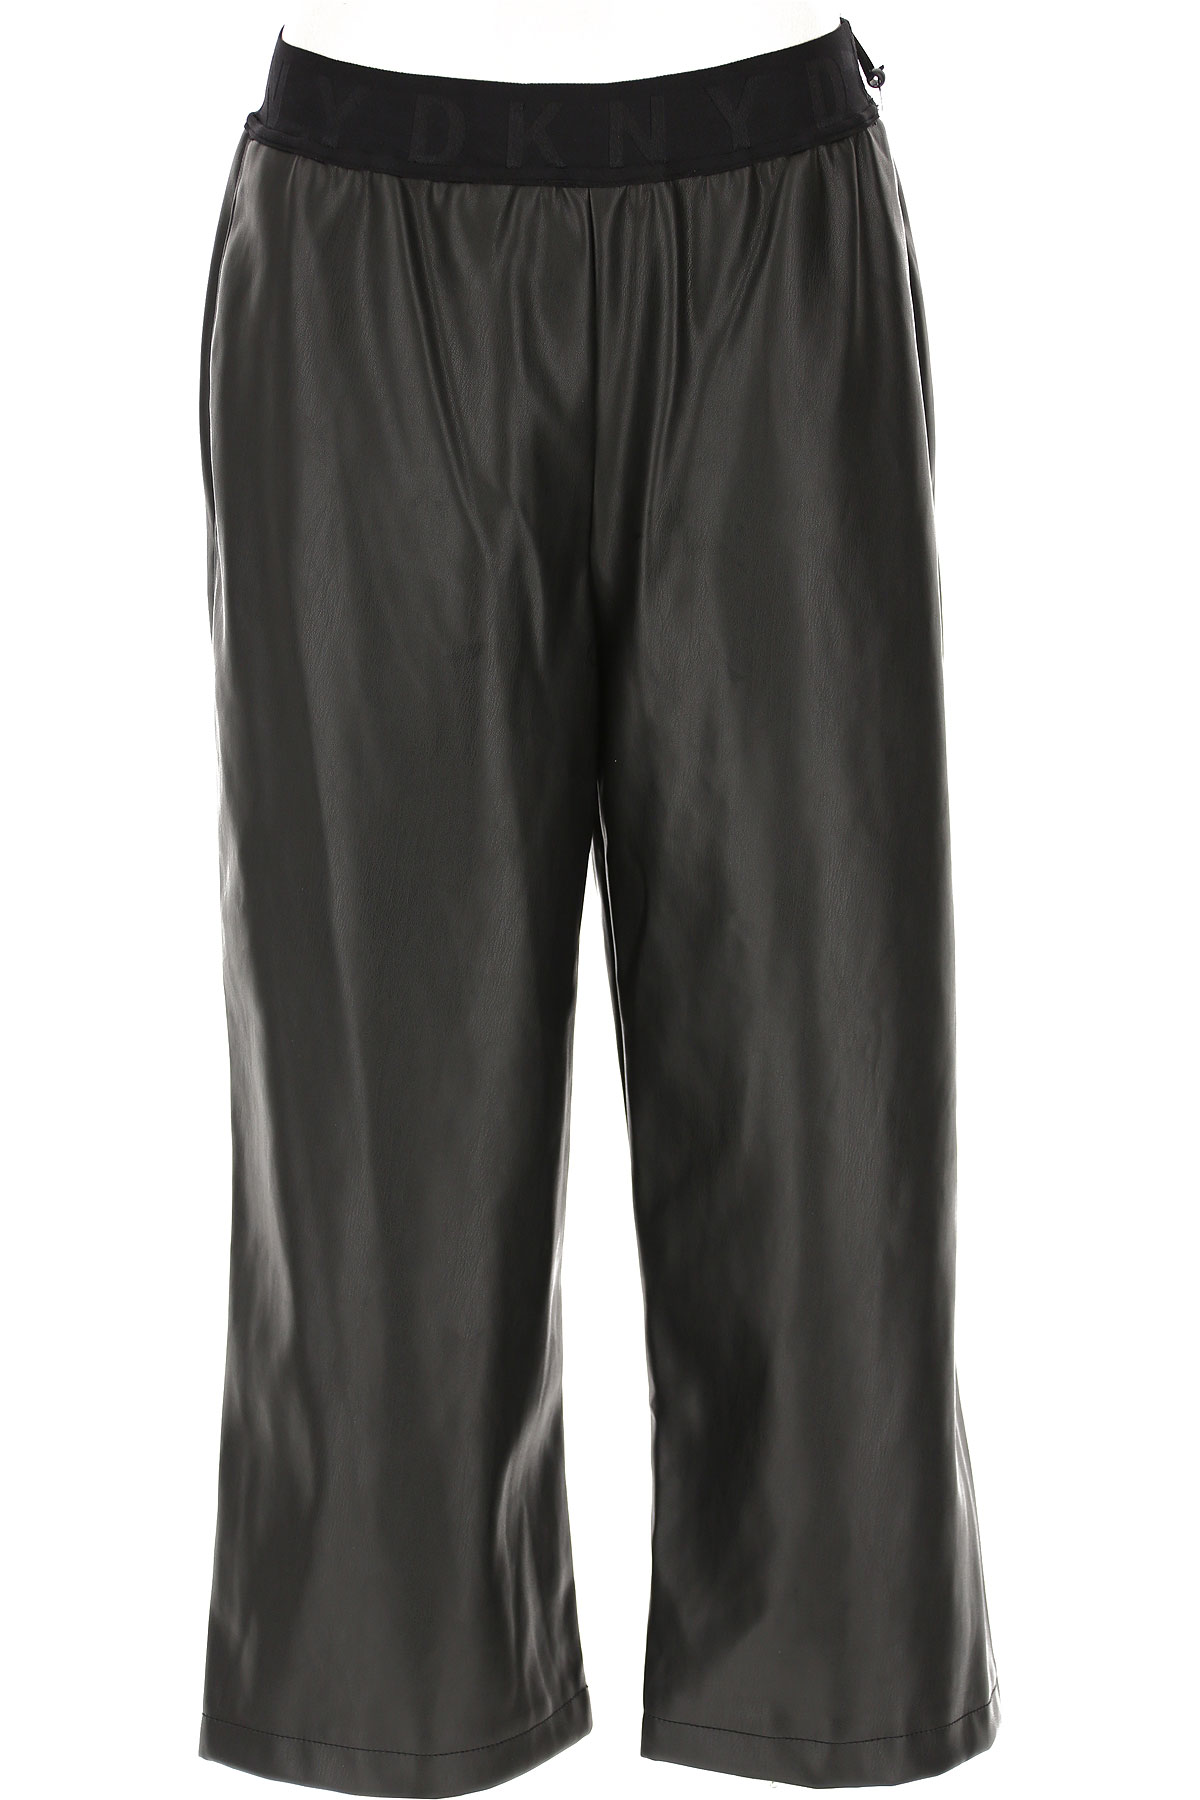 DKNY Pants for Women, Black, polyurethane, 2019, 2 4 6